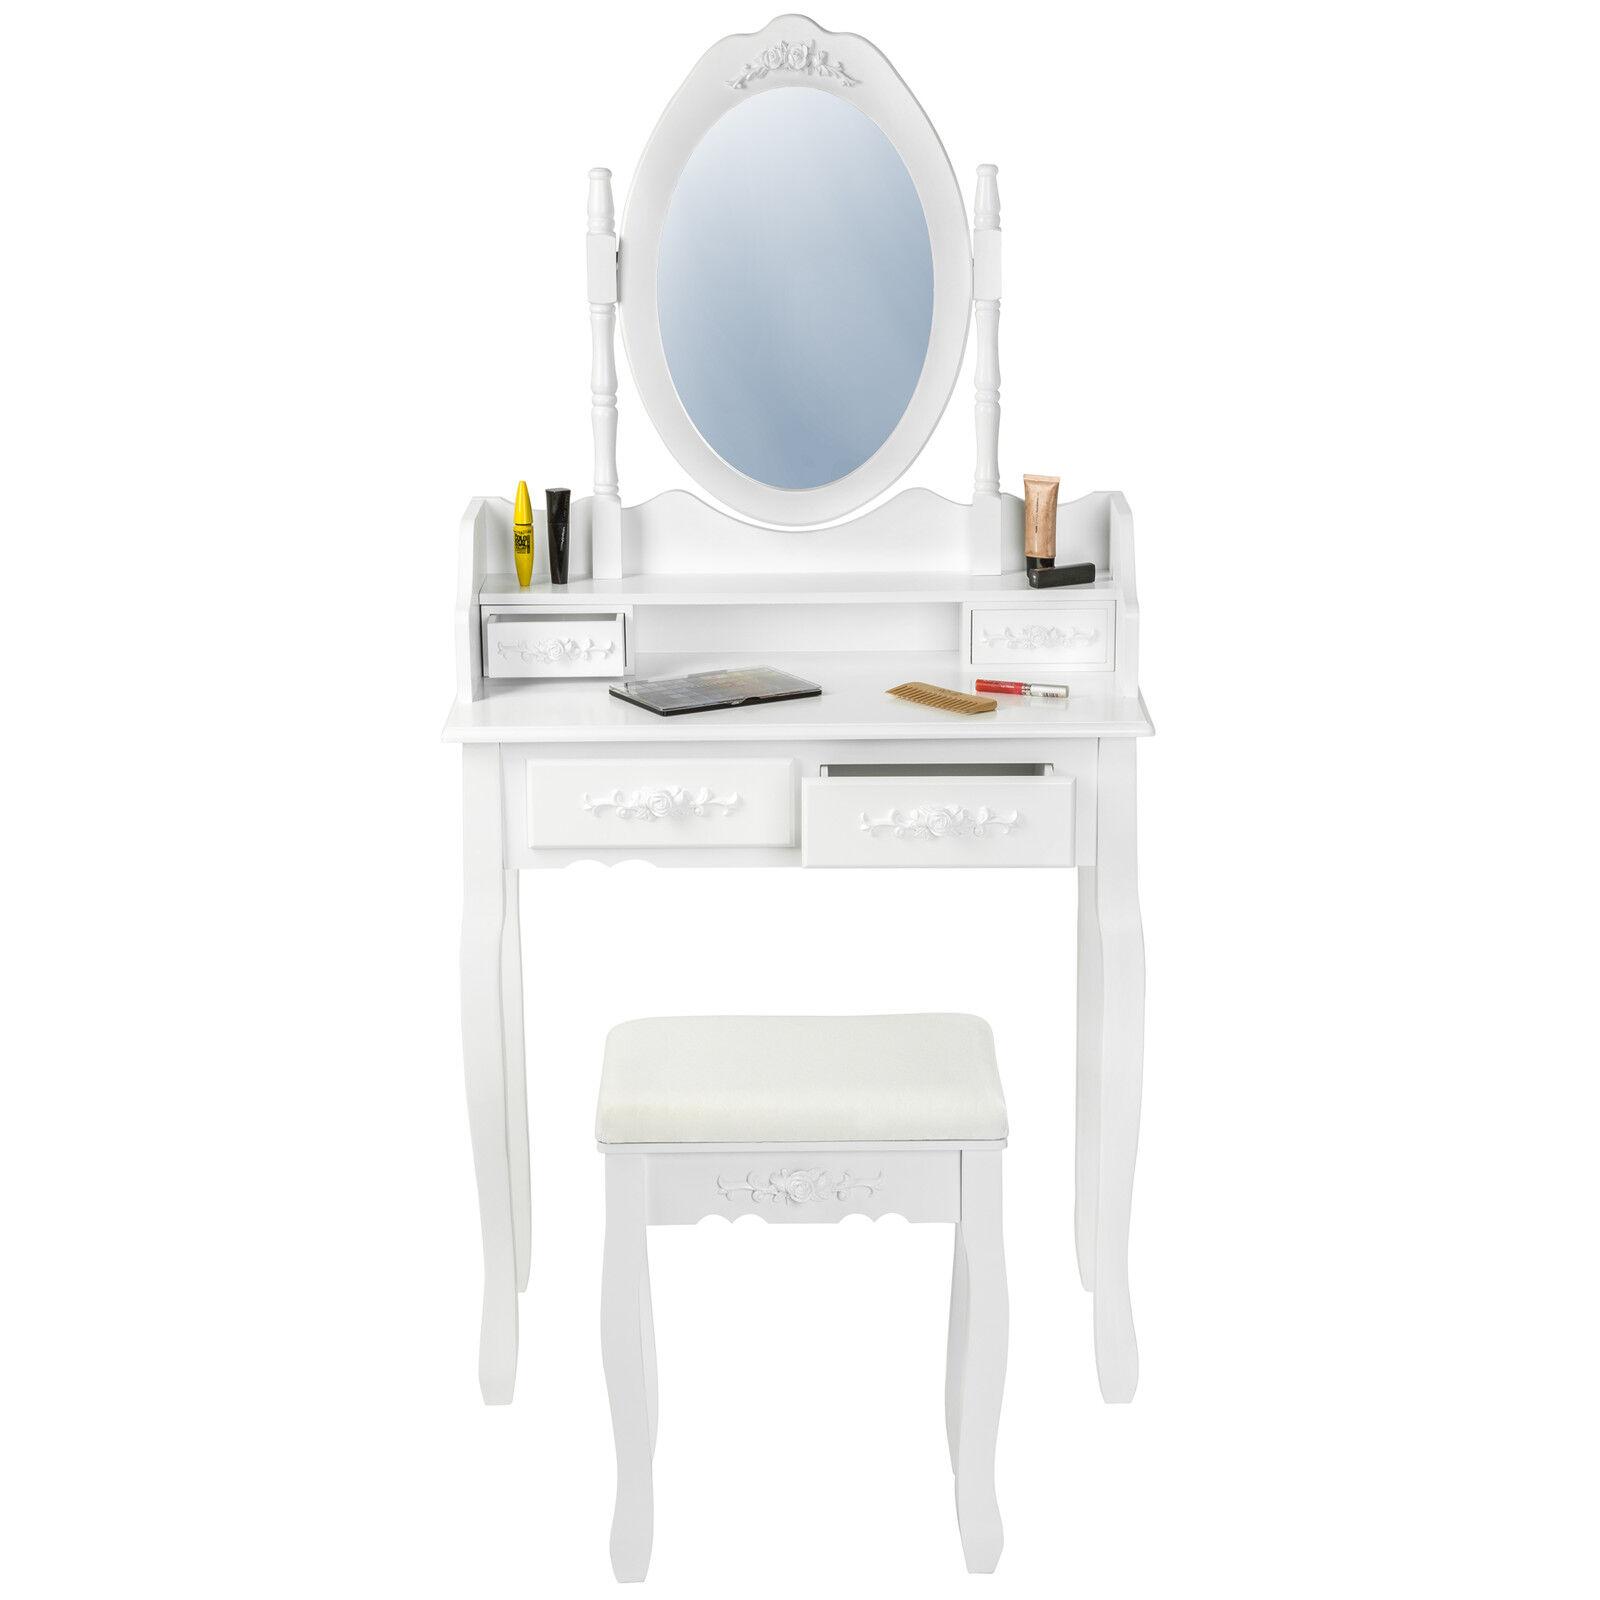 Meuble coiffeuse avec miroir maison design - Meuble coiffeuse avec miroir conforama ...